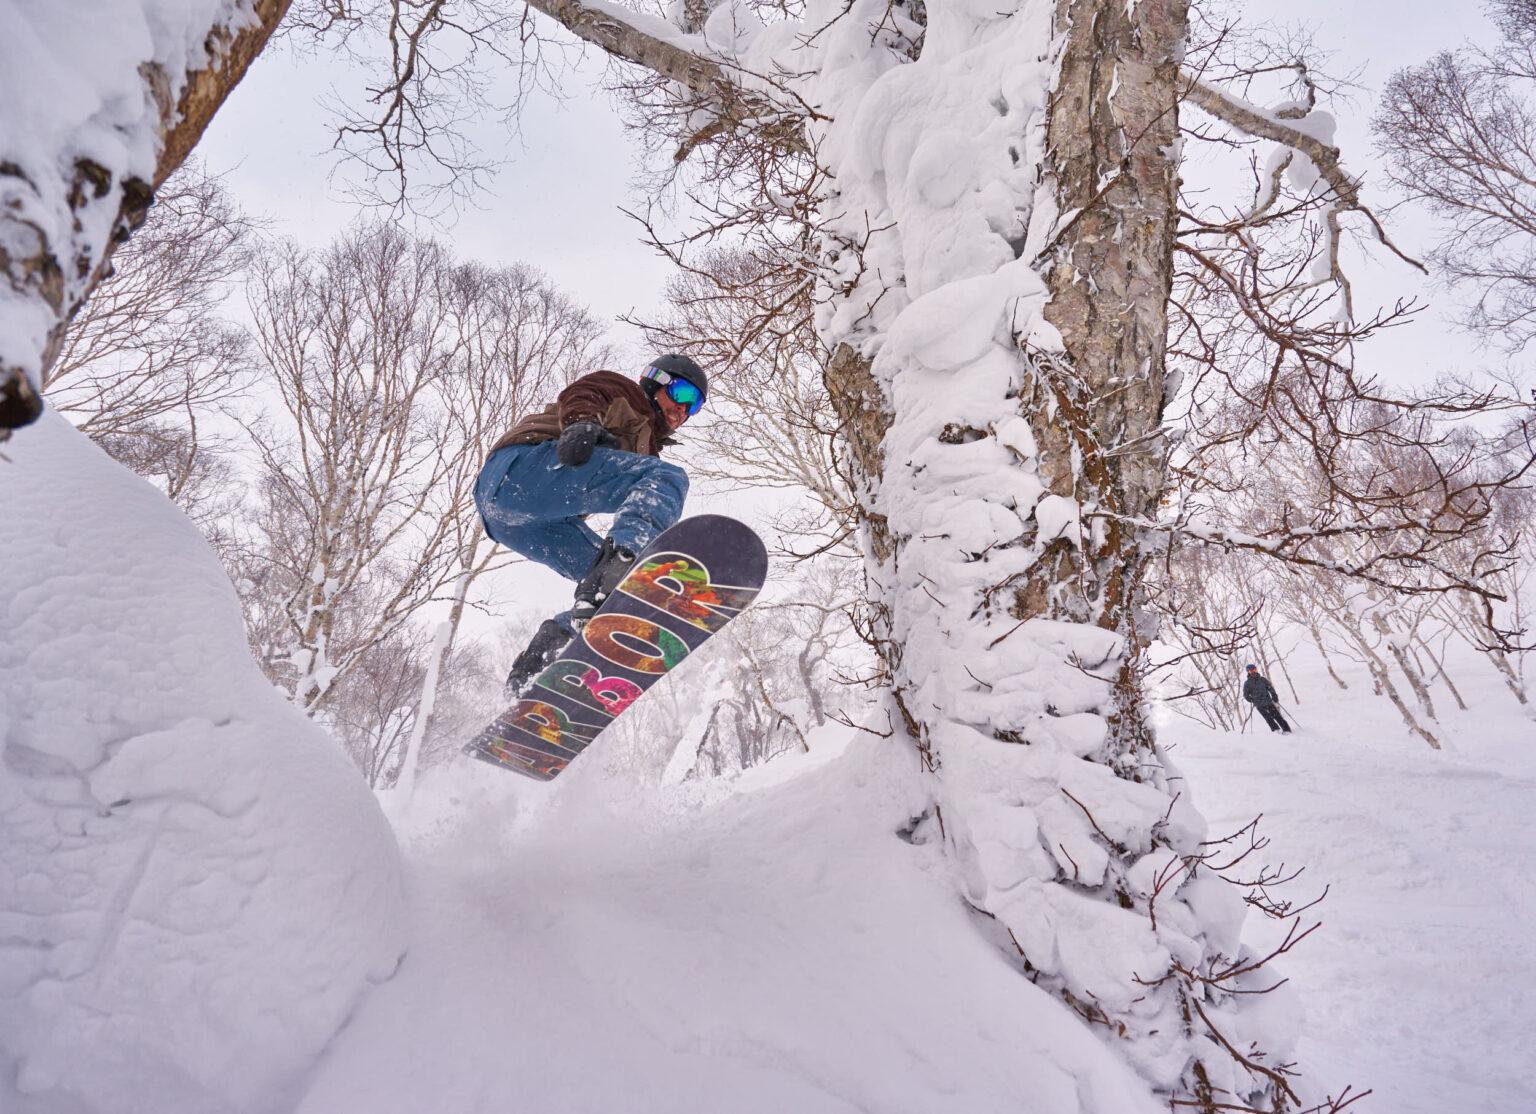 Erie flying through the trees at Rotsuko powder snow line